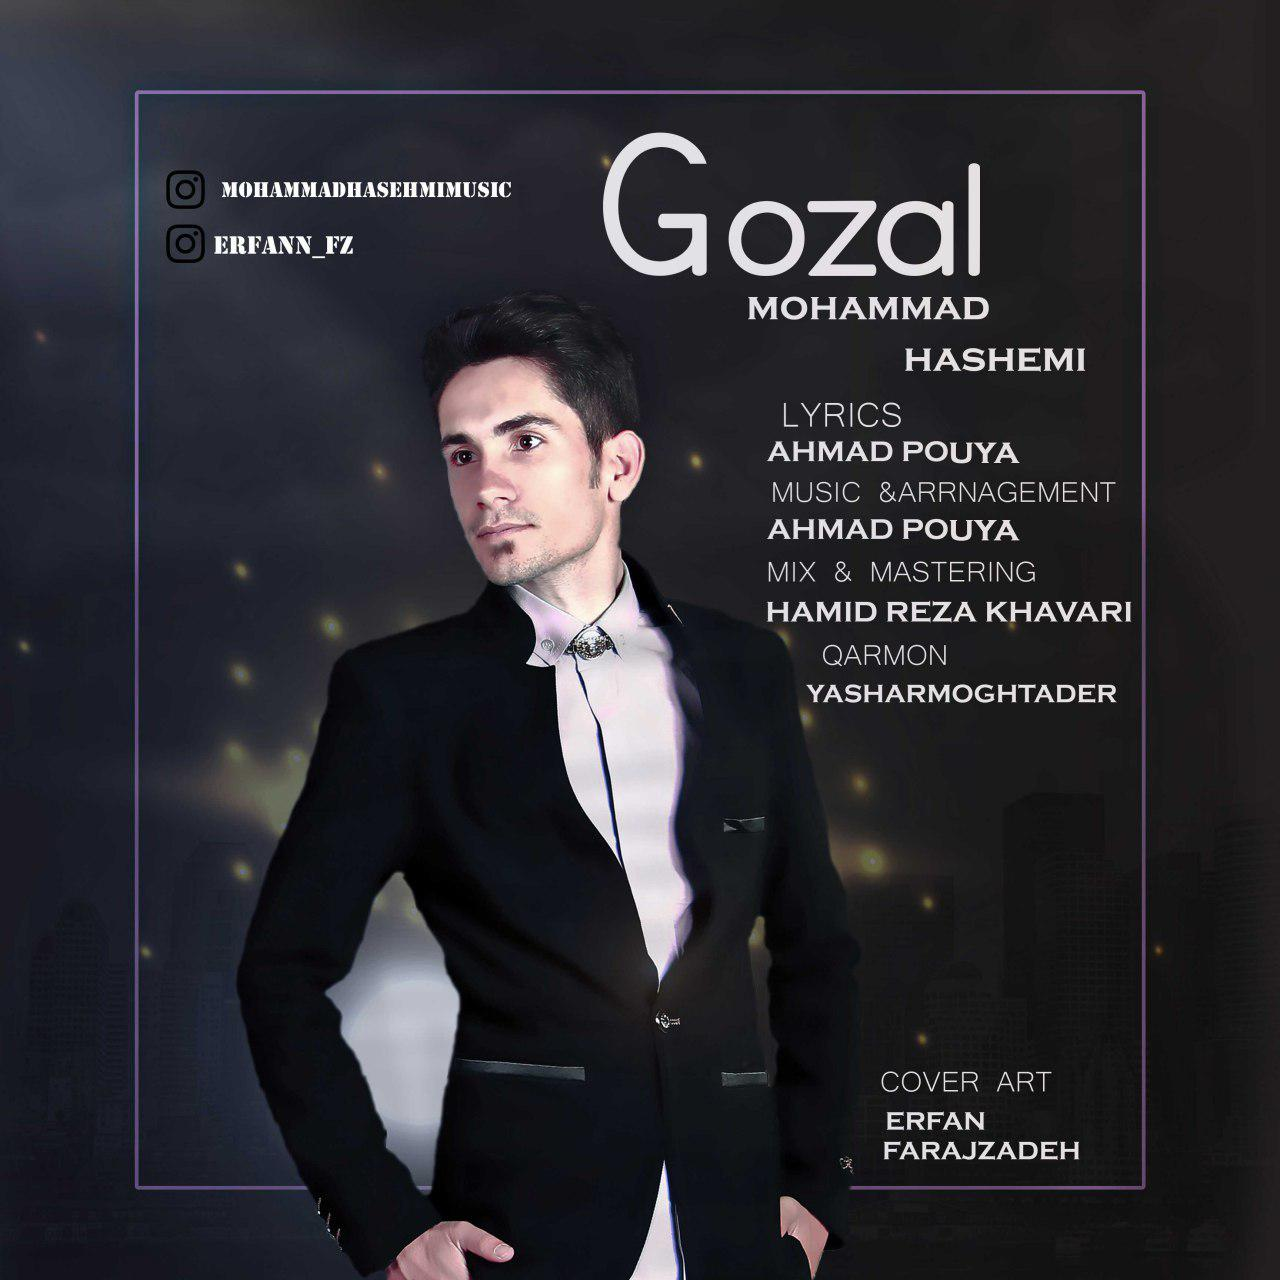 http://s8.picofile.com/file/8357636968/15Mohammad_Hashemi_Gozal.jpg